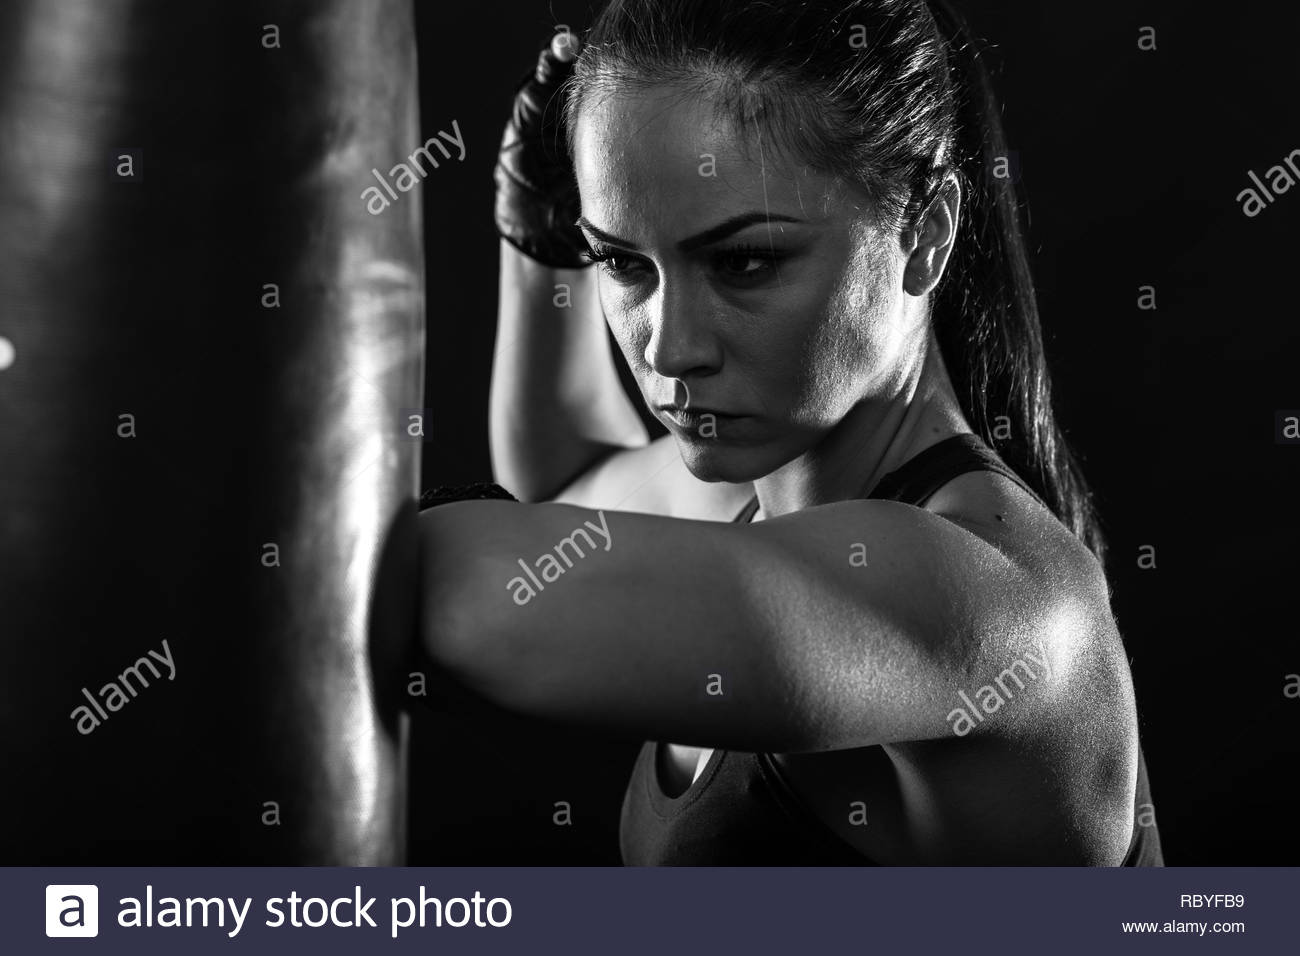 Studio shot of female boxer punching a boxing bag. - Stock Image